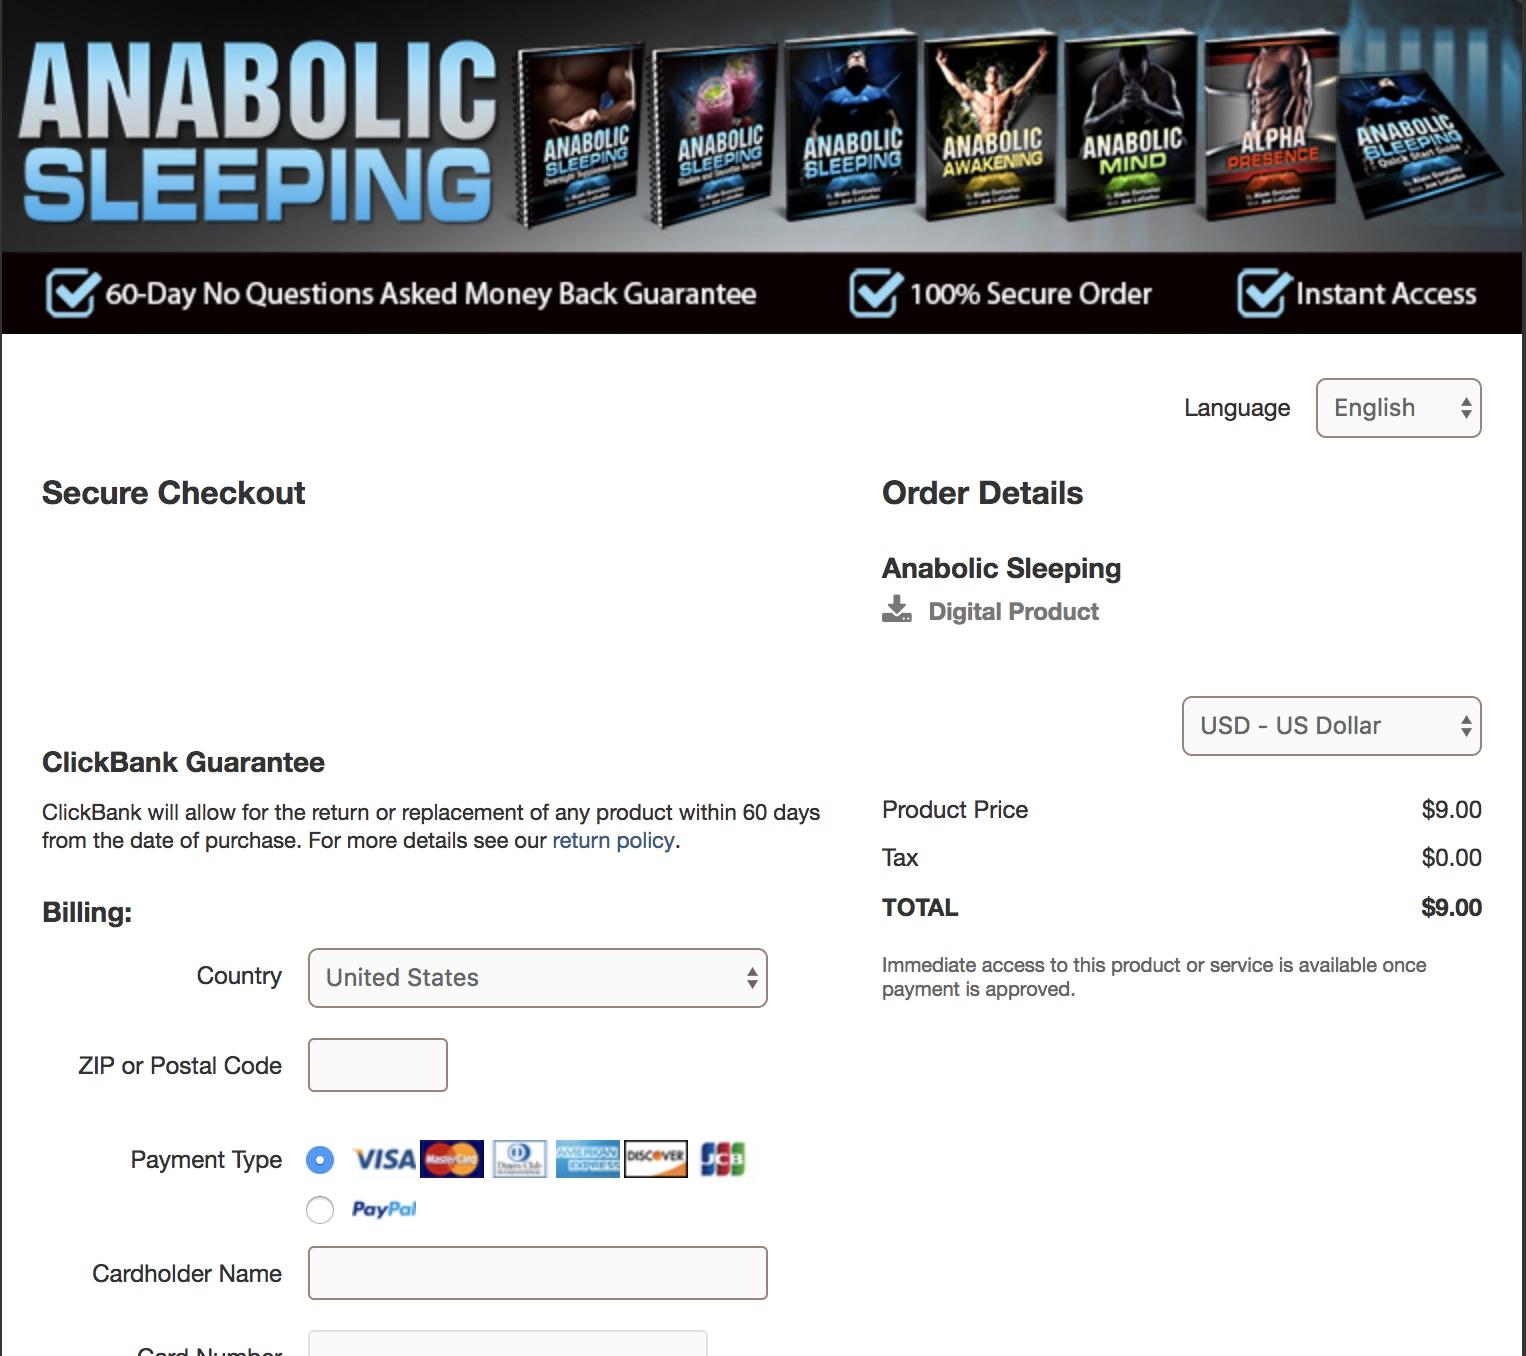 Anabolic Sleeping Order